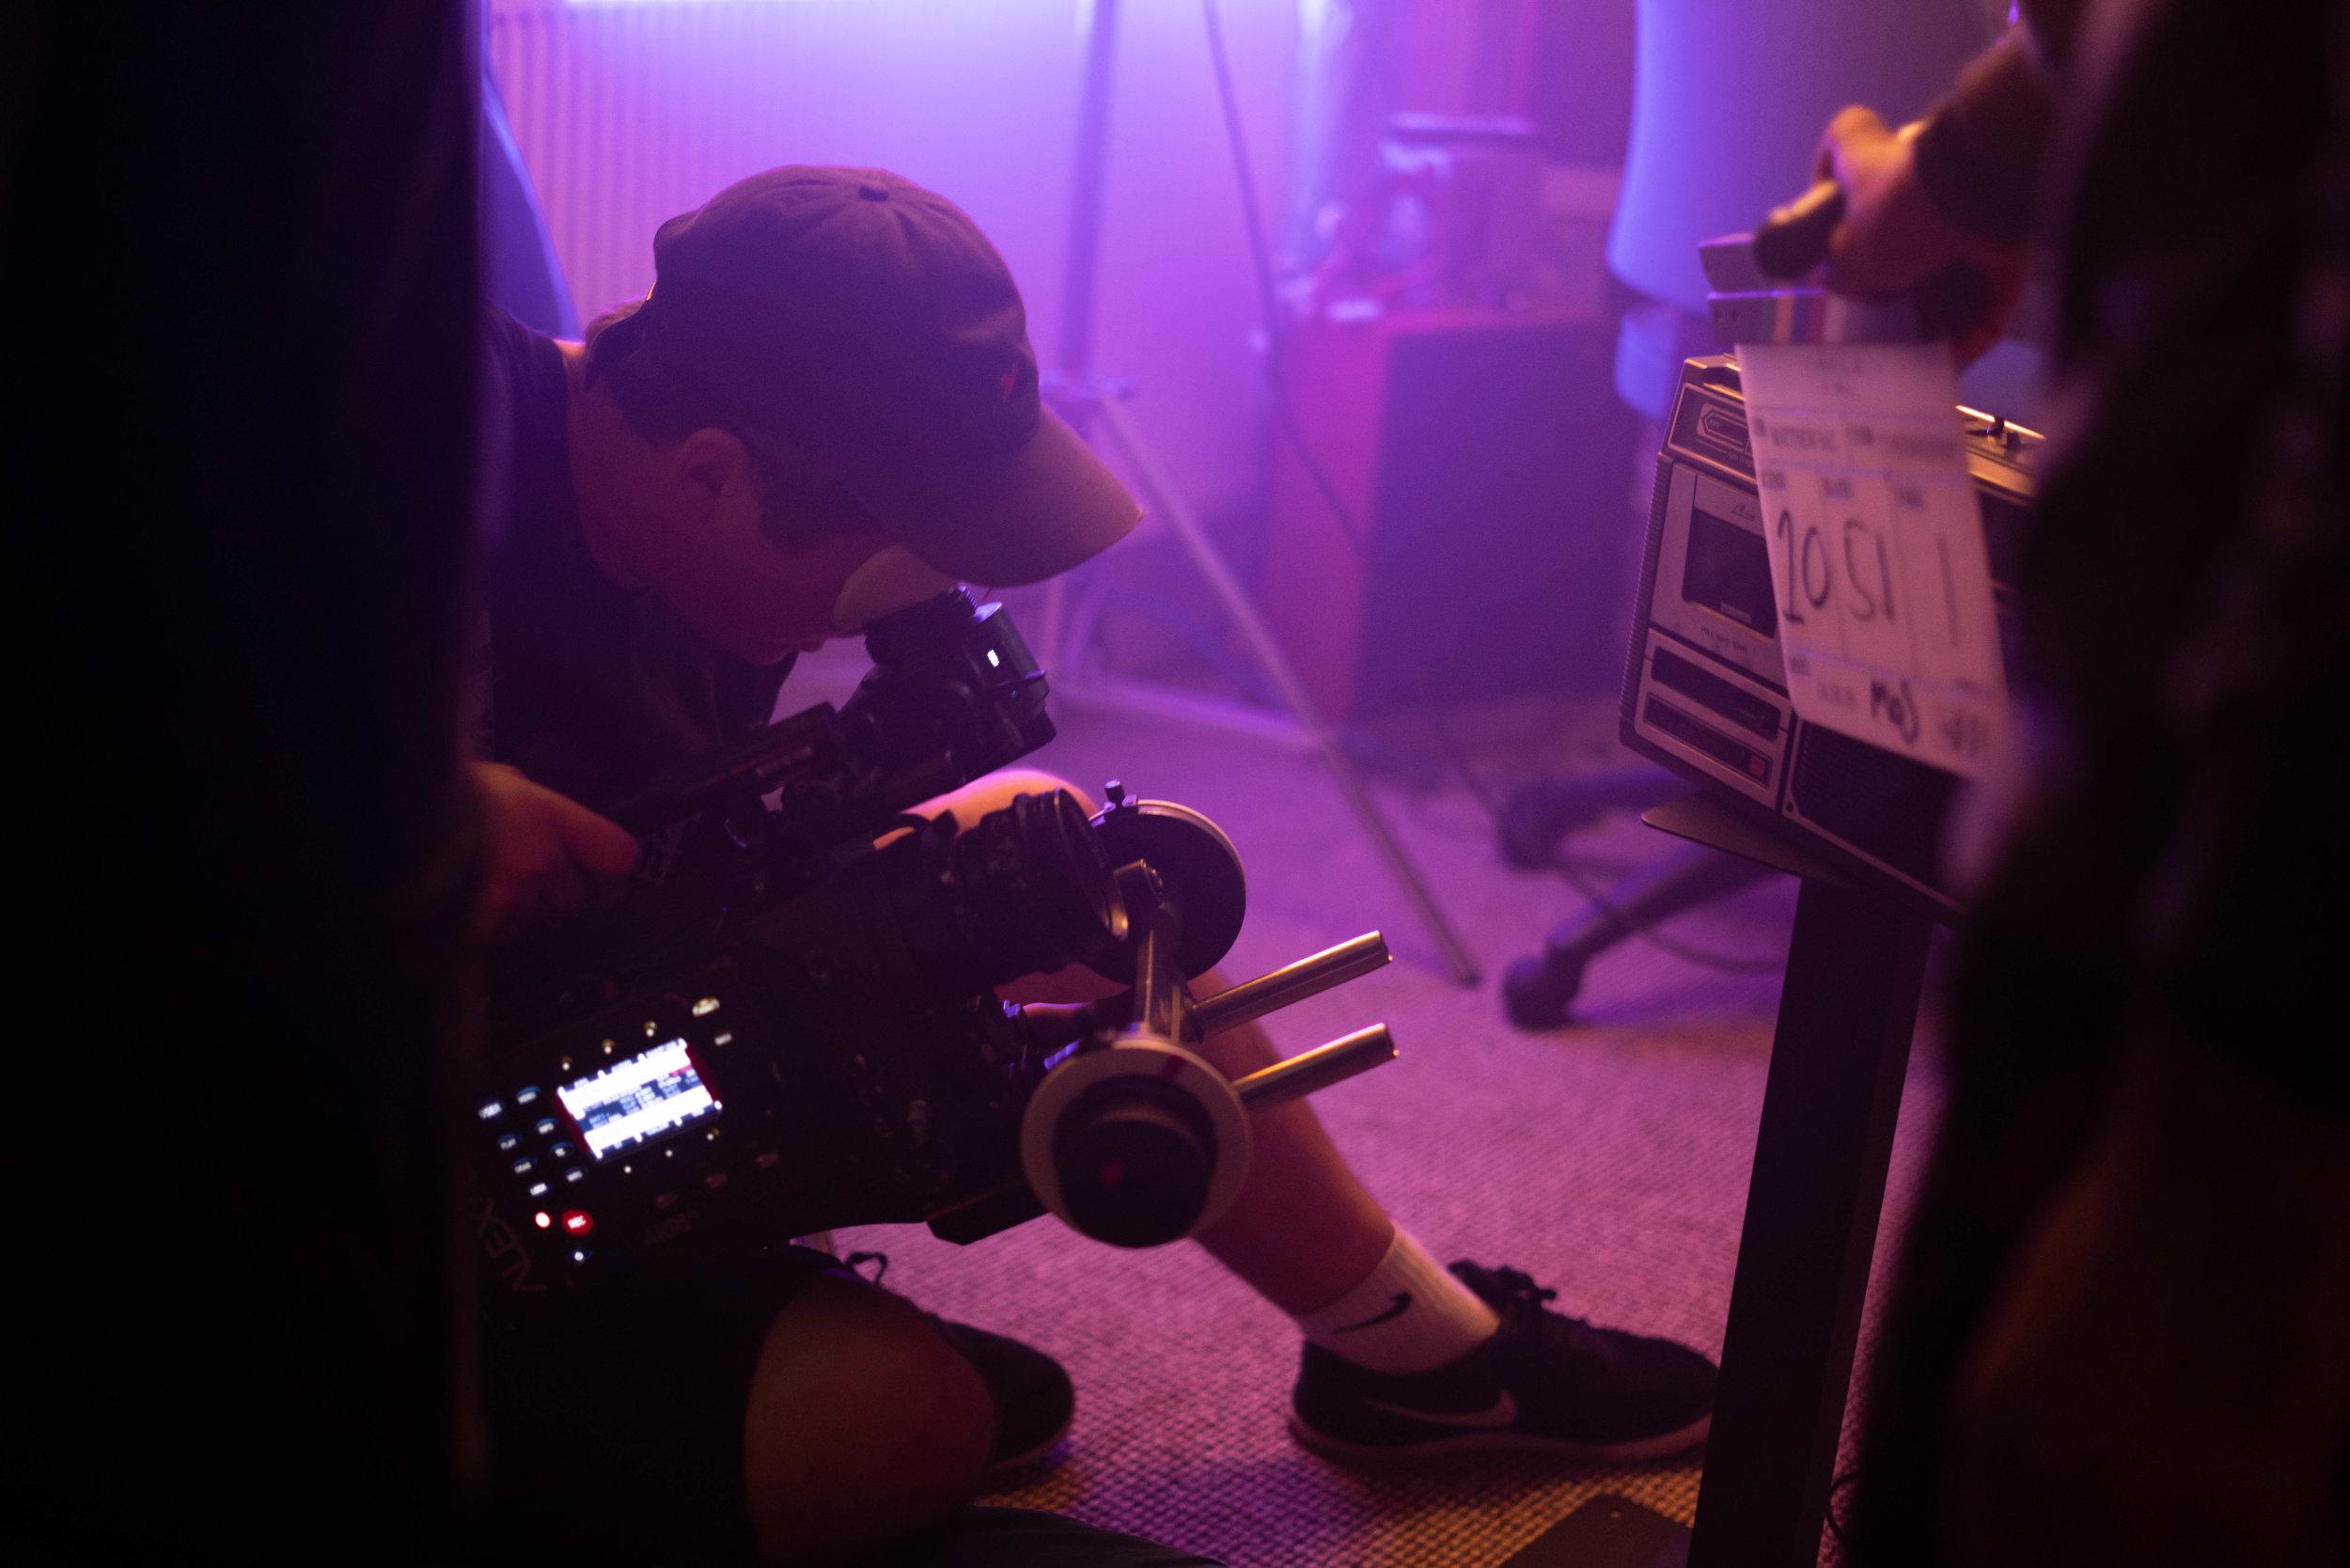 Director of Photography Thomas Pierrepont